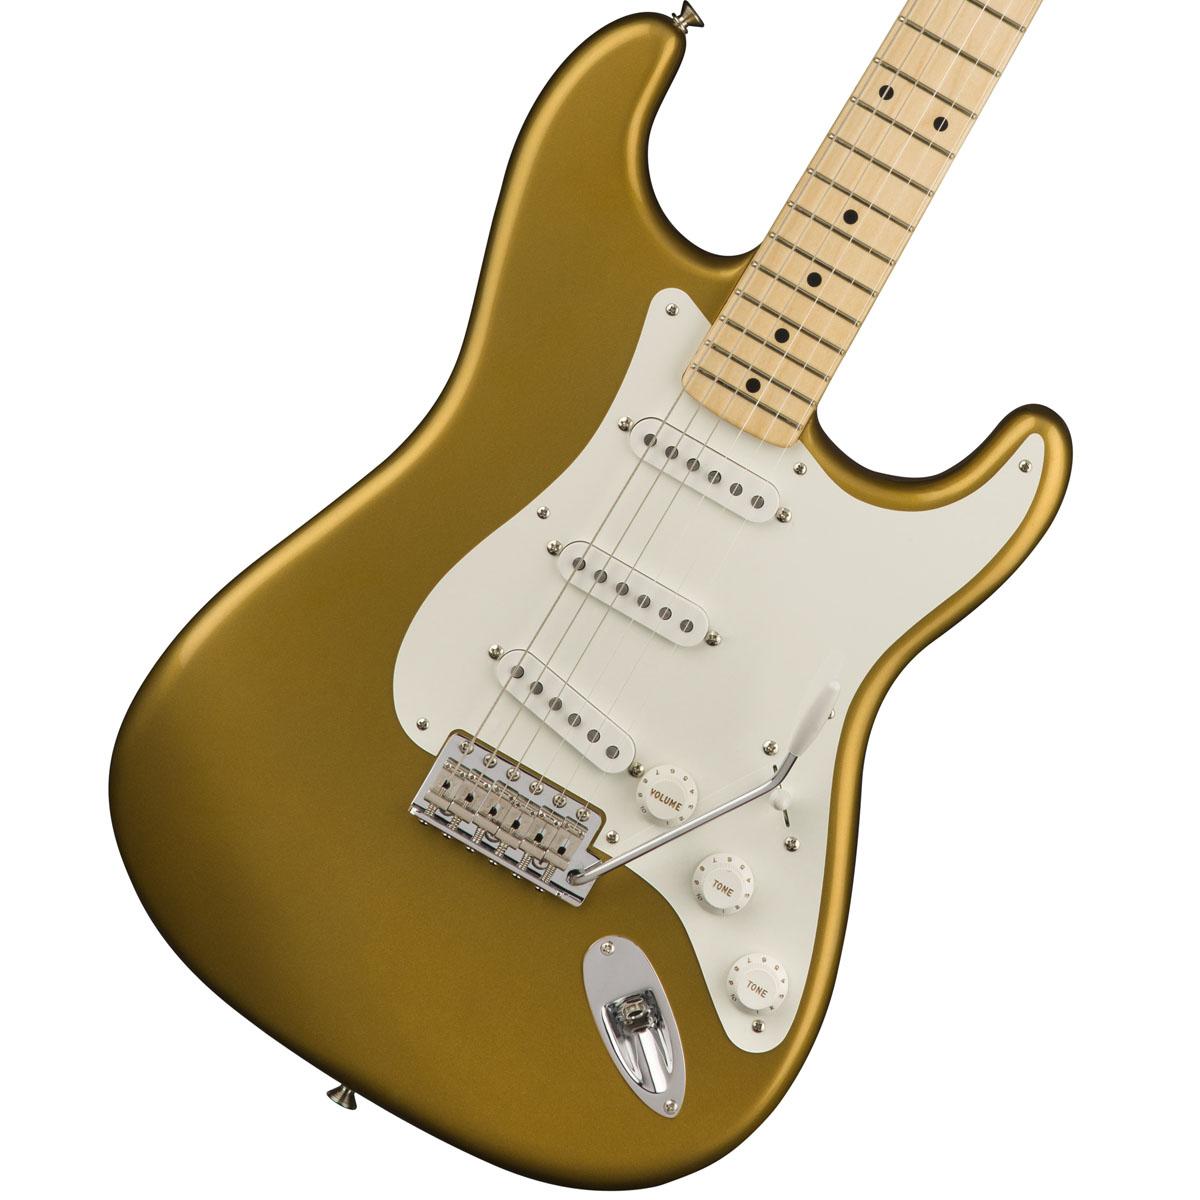 Fender USA / American Original 50s Stratocaster Aztec Gold 《カスタムショップのお手入れ用品を進呈/+671038200》《フェンダー純正グッズを進呈/+79083》